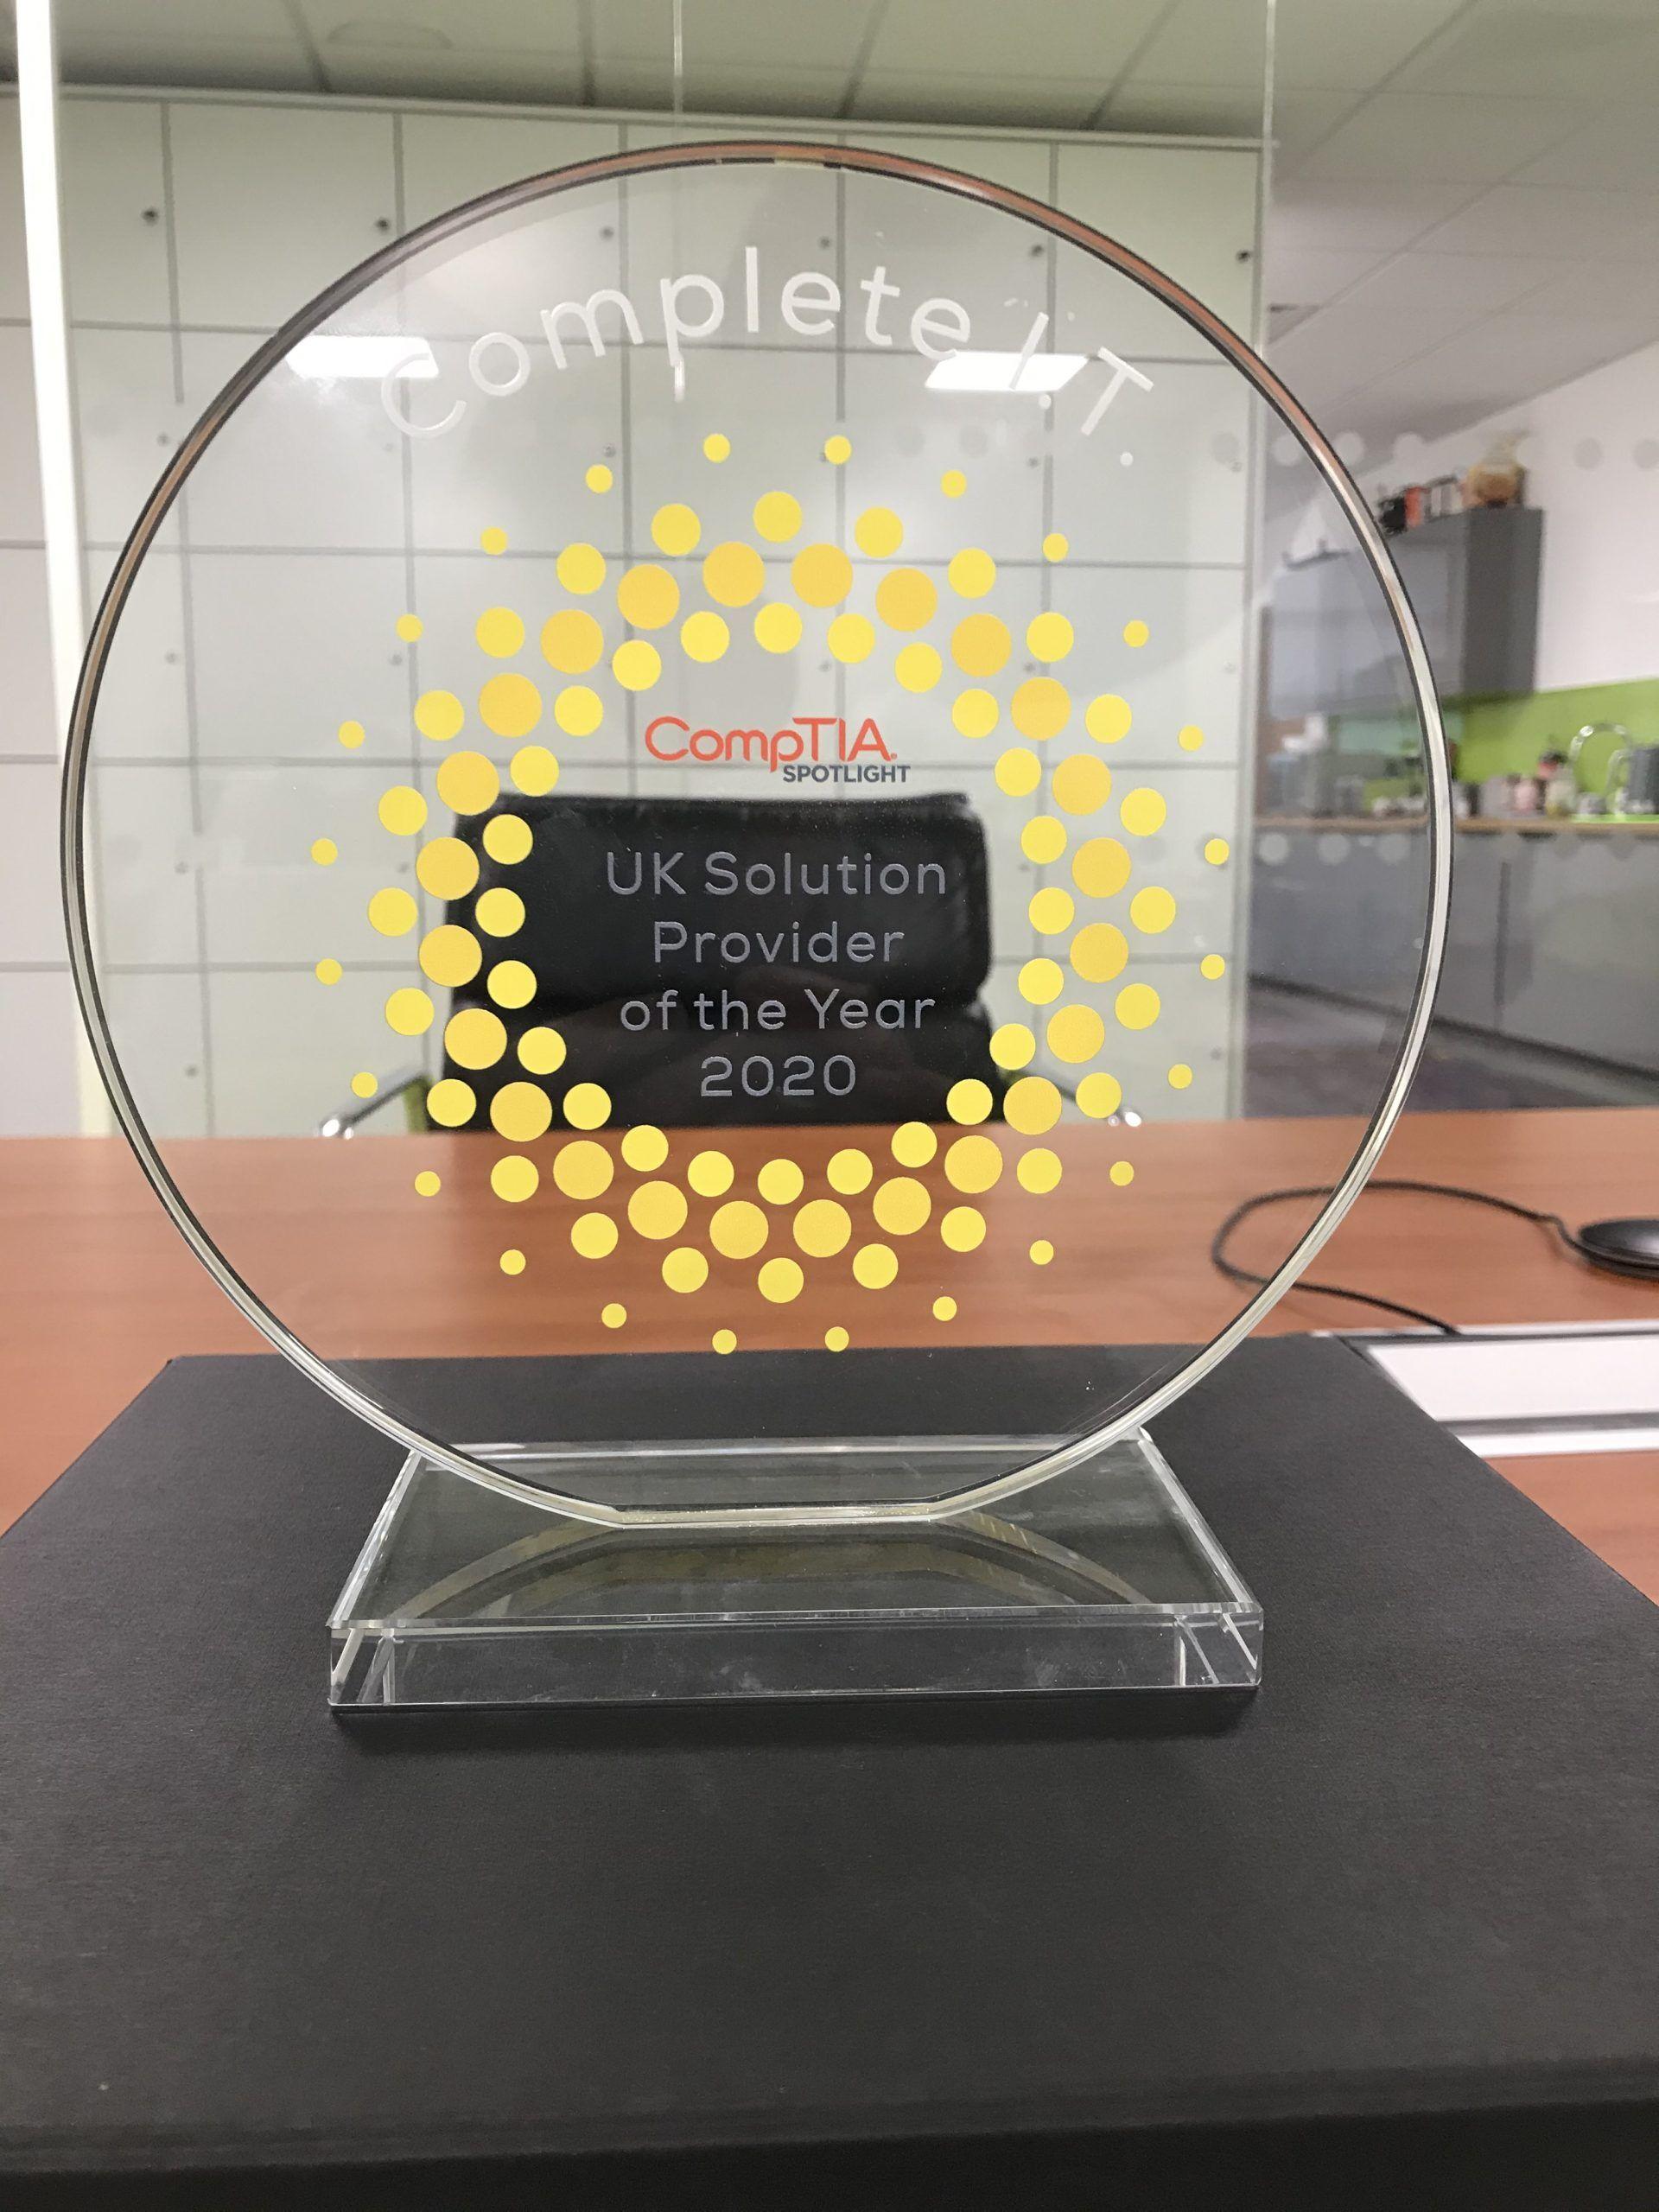 Complete I.T. wins Comptia Award